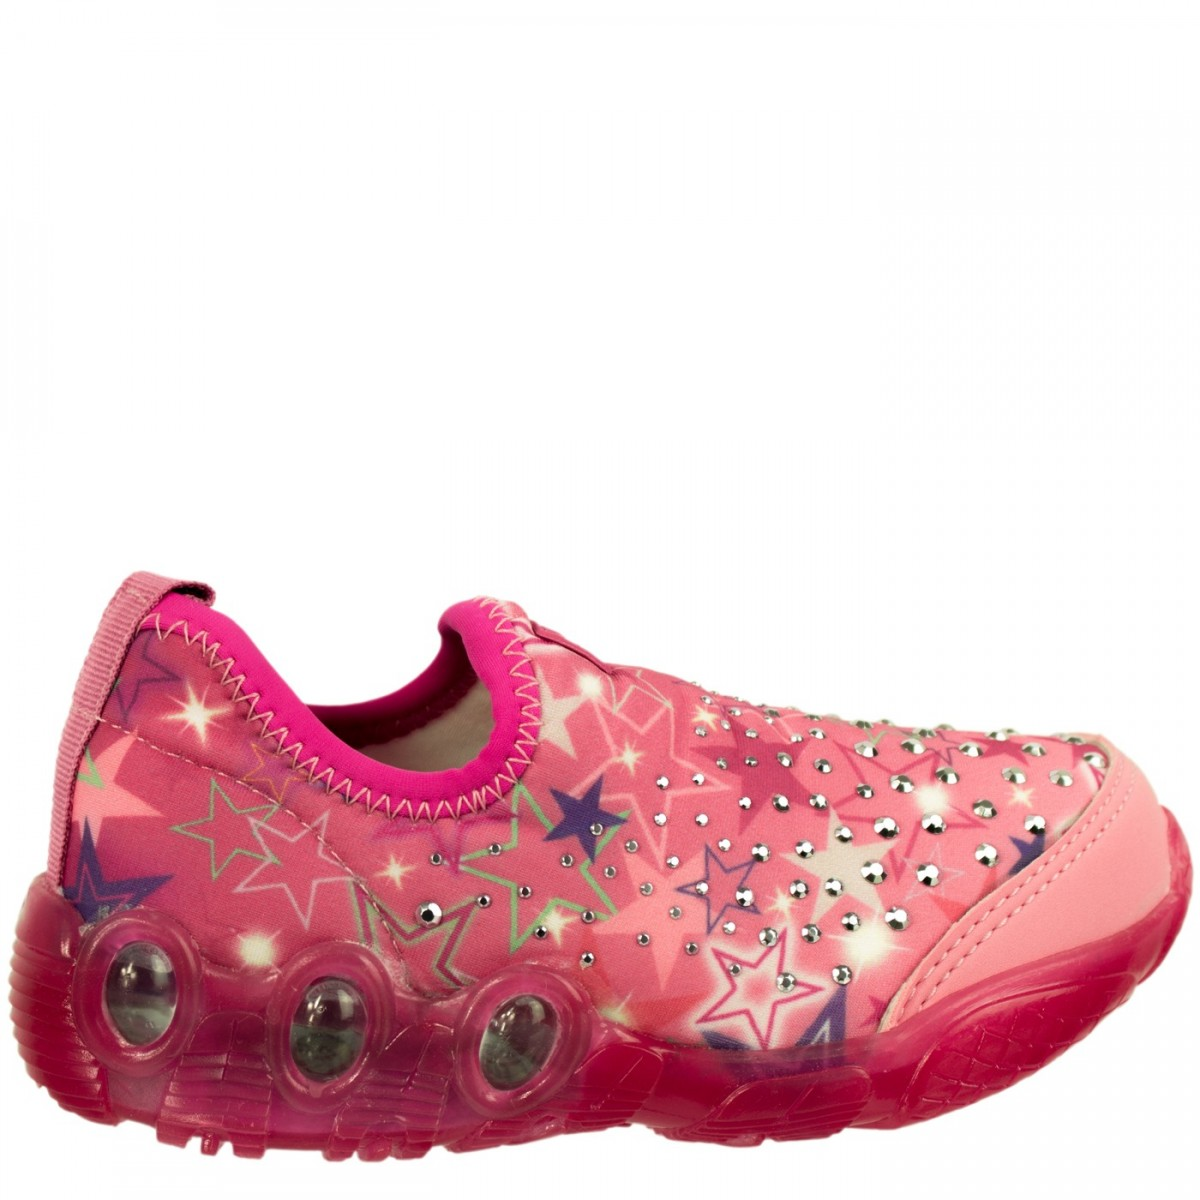 b1ddd036c2 Bizz Store - Tênis Infantil Menina Bibi Space Wave Com Luzinhas